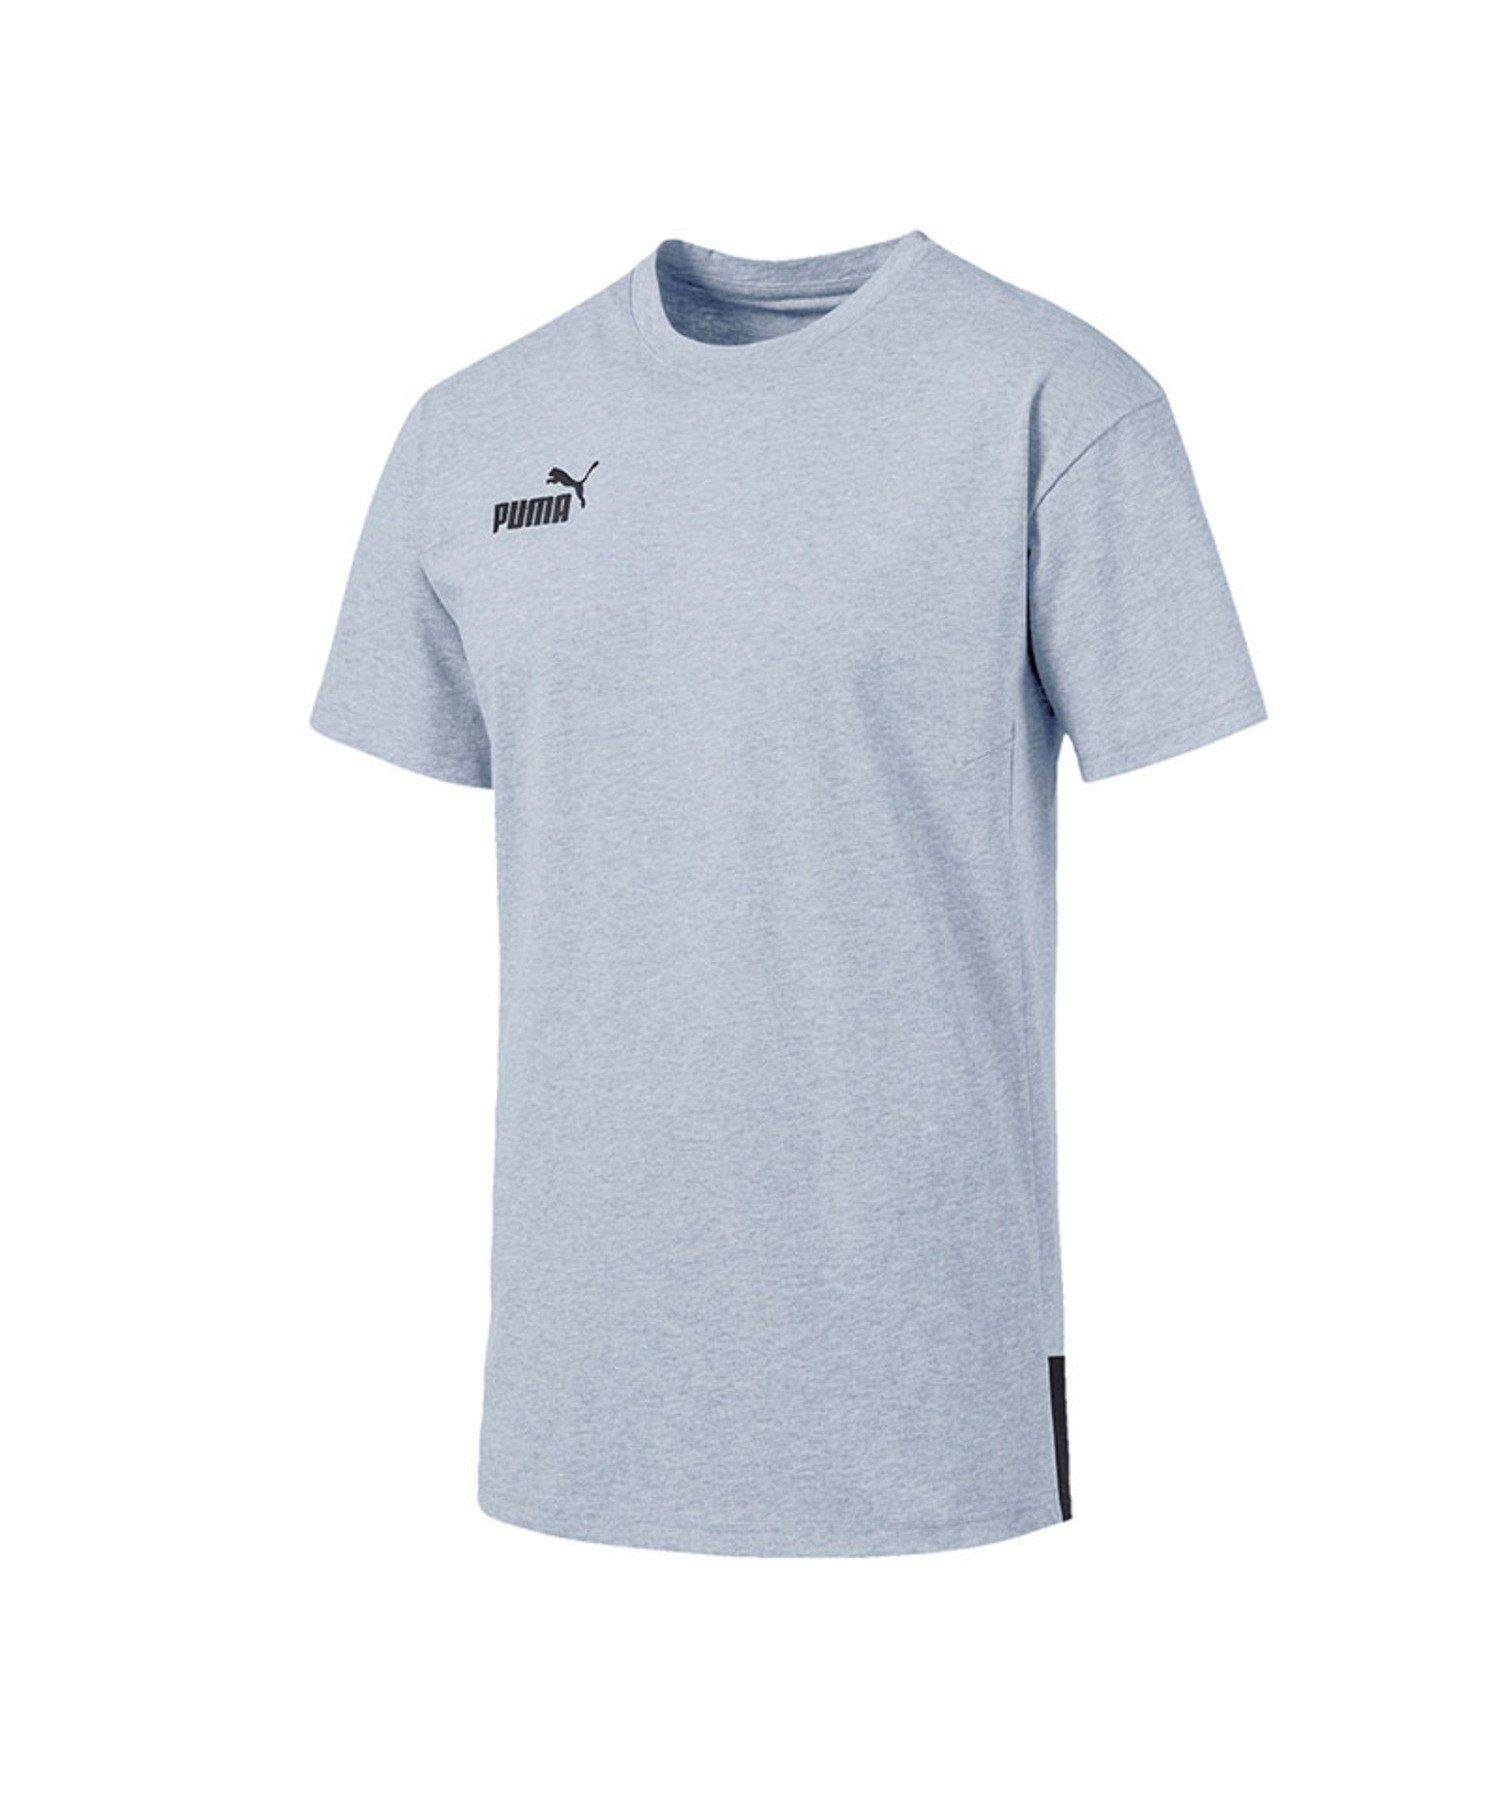 PUMA ftblNXT Casuals T-Shirt Grau F01 - grau